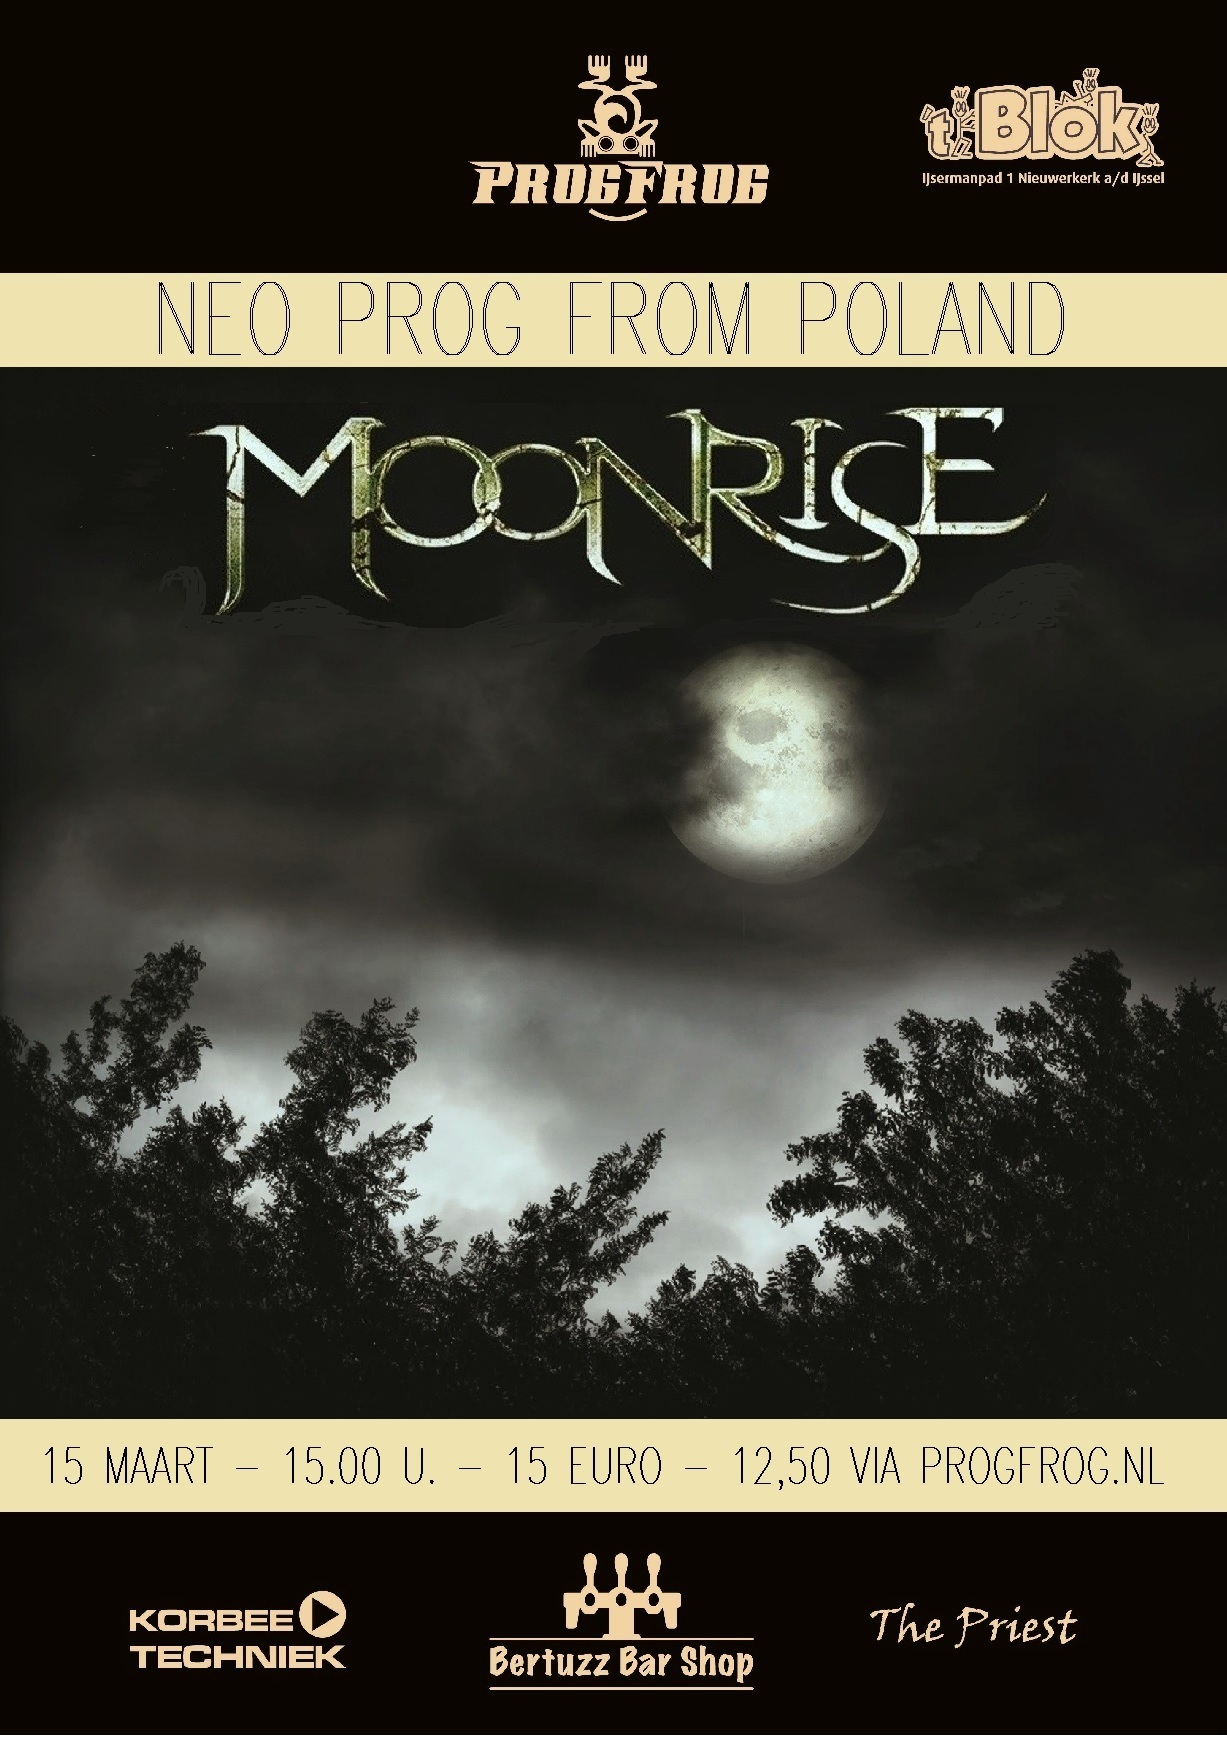 Moonrise (Poland)